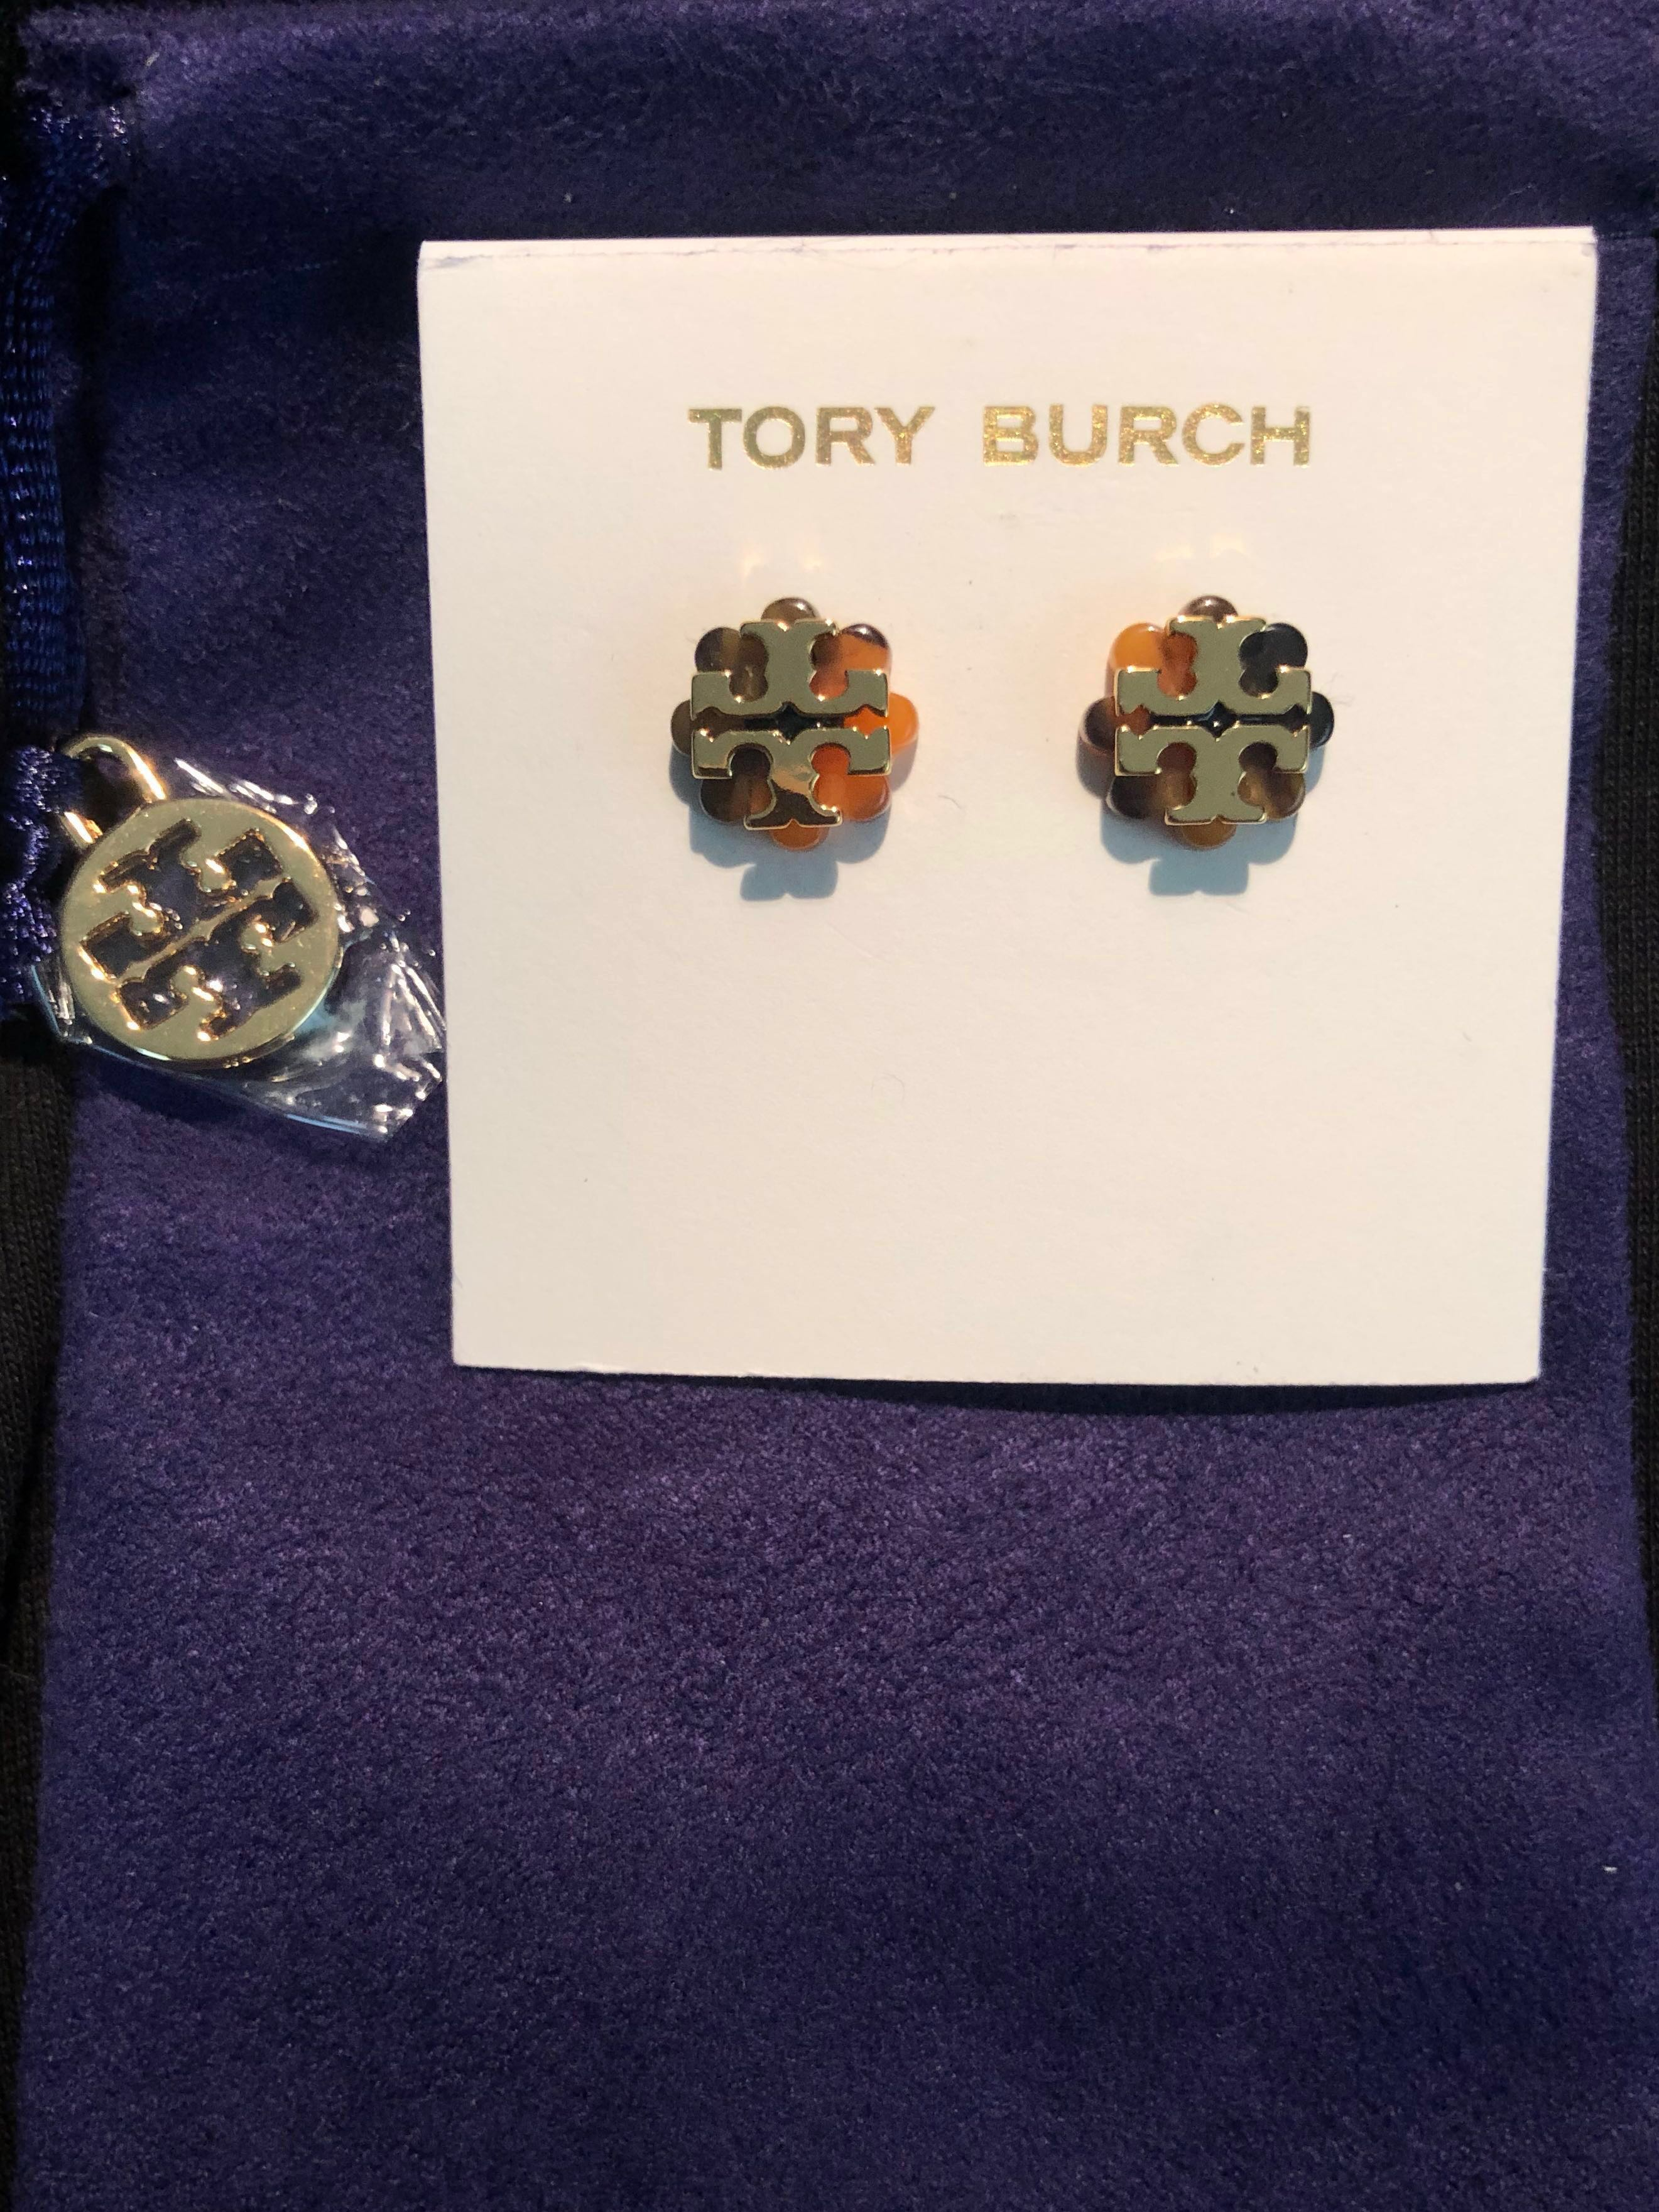 f3c3a9788 Tory Burch Original Gold Logo Earrings in elegant tortoise base ...